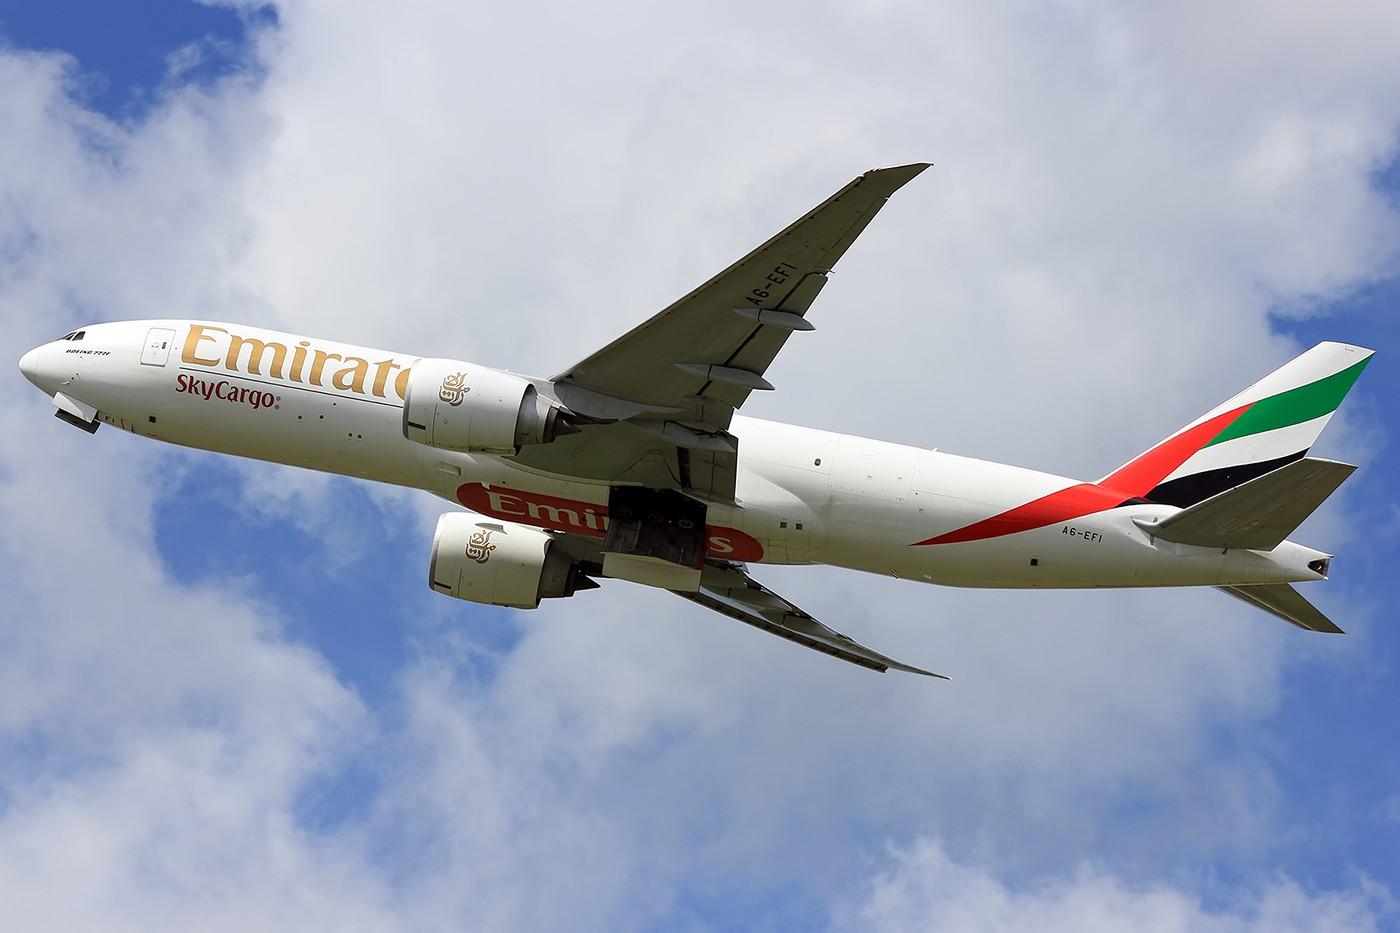 Re:[原创]【AMS】阿姆斯特丹常规卡狗一组 1400*933 BOEING 777-200 A6-EFI 荷兰阿姆斯特丹史基浦机场